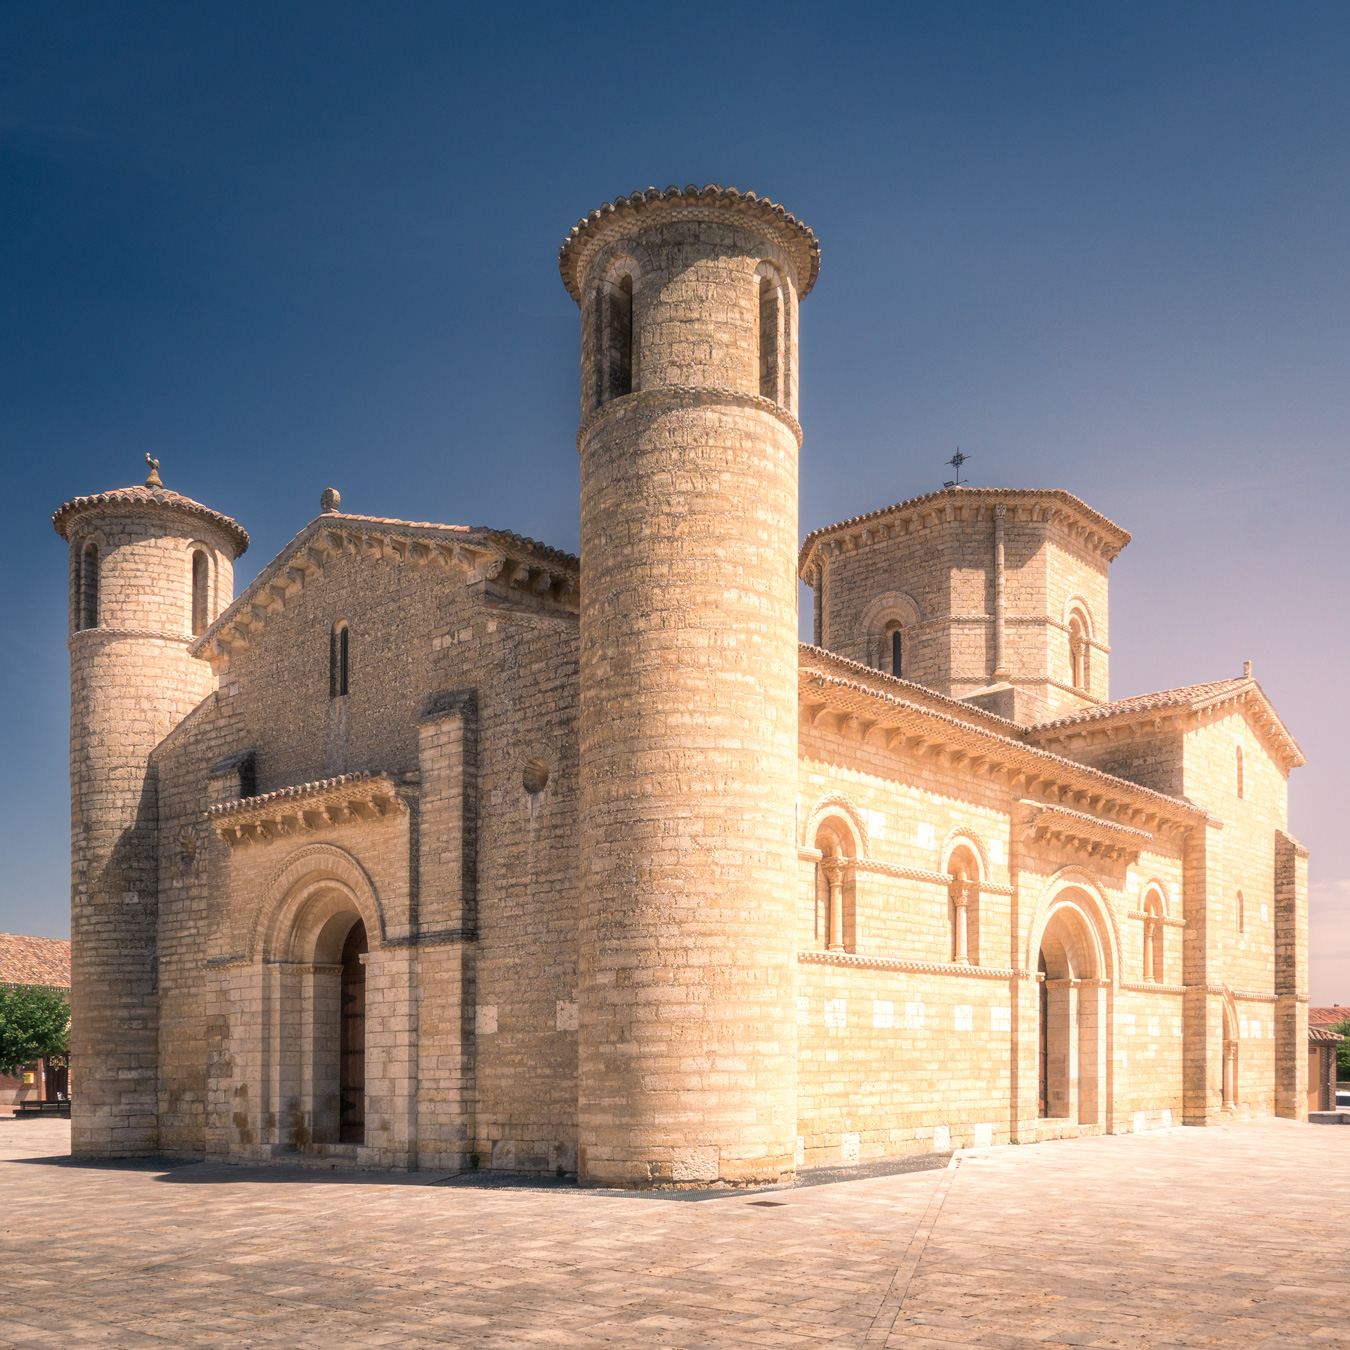 Church of St Martin de Tours, Spain